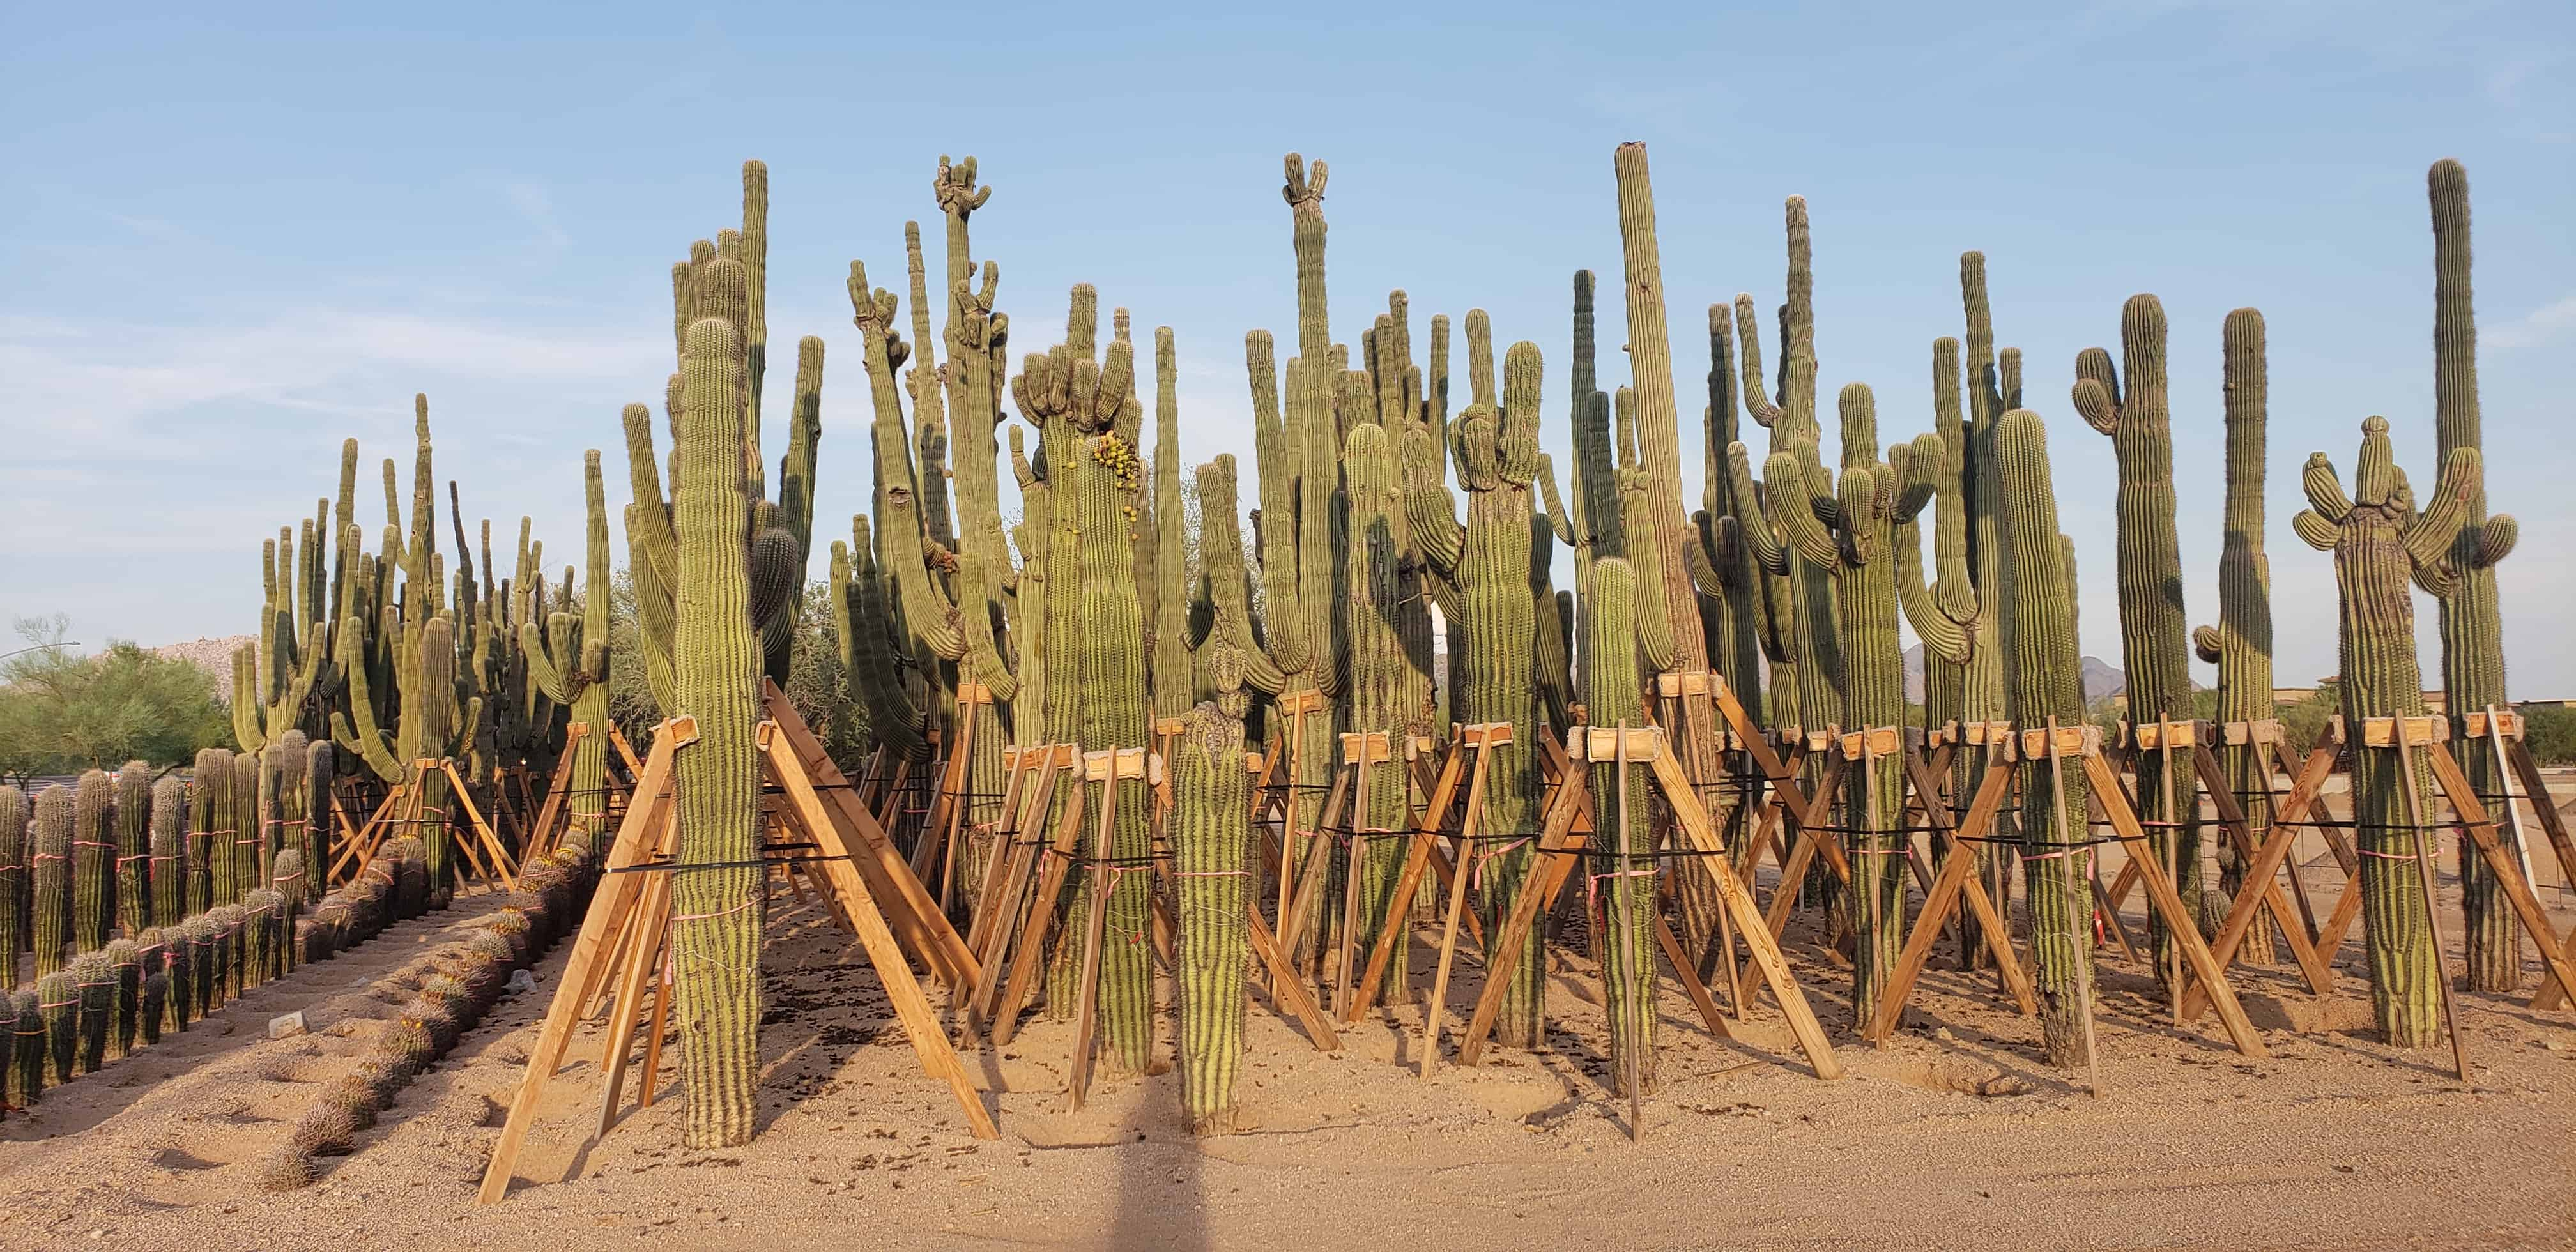 Saguaros in Scottsdale